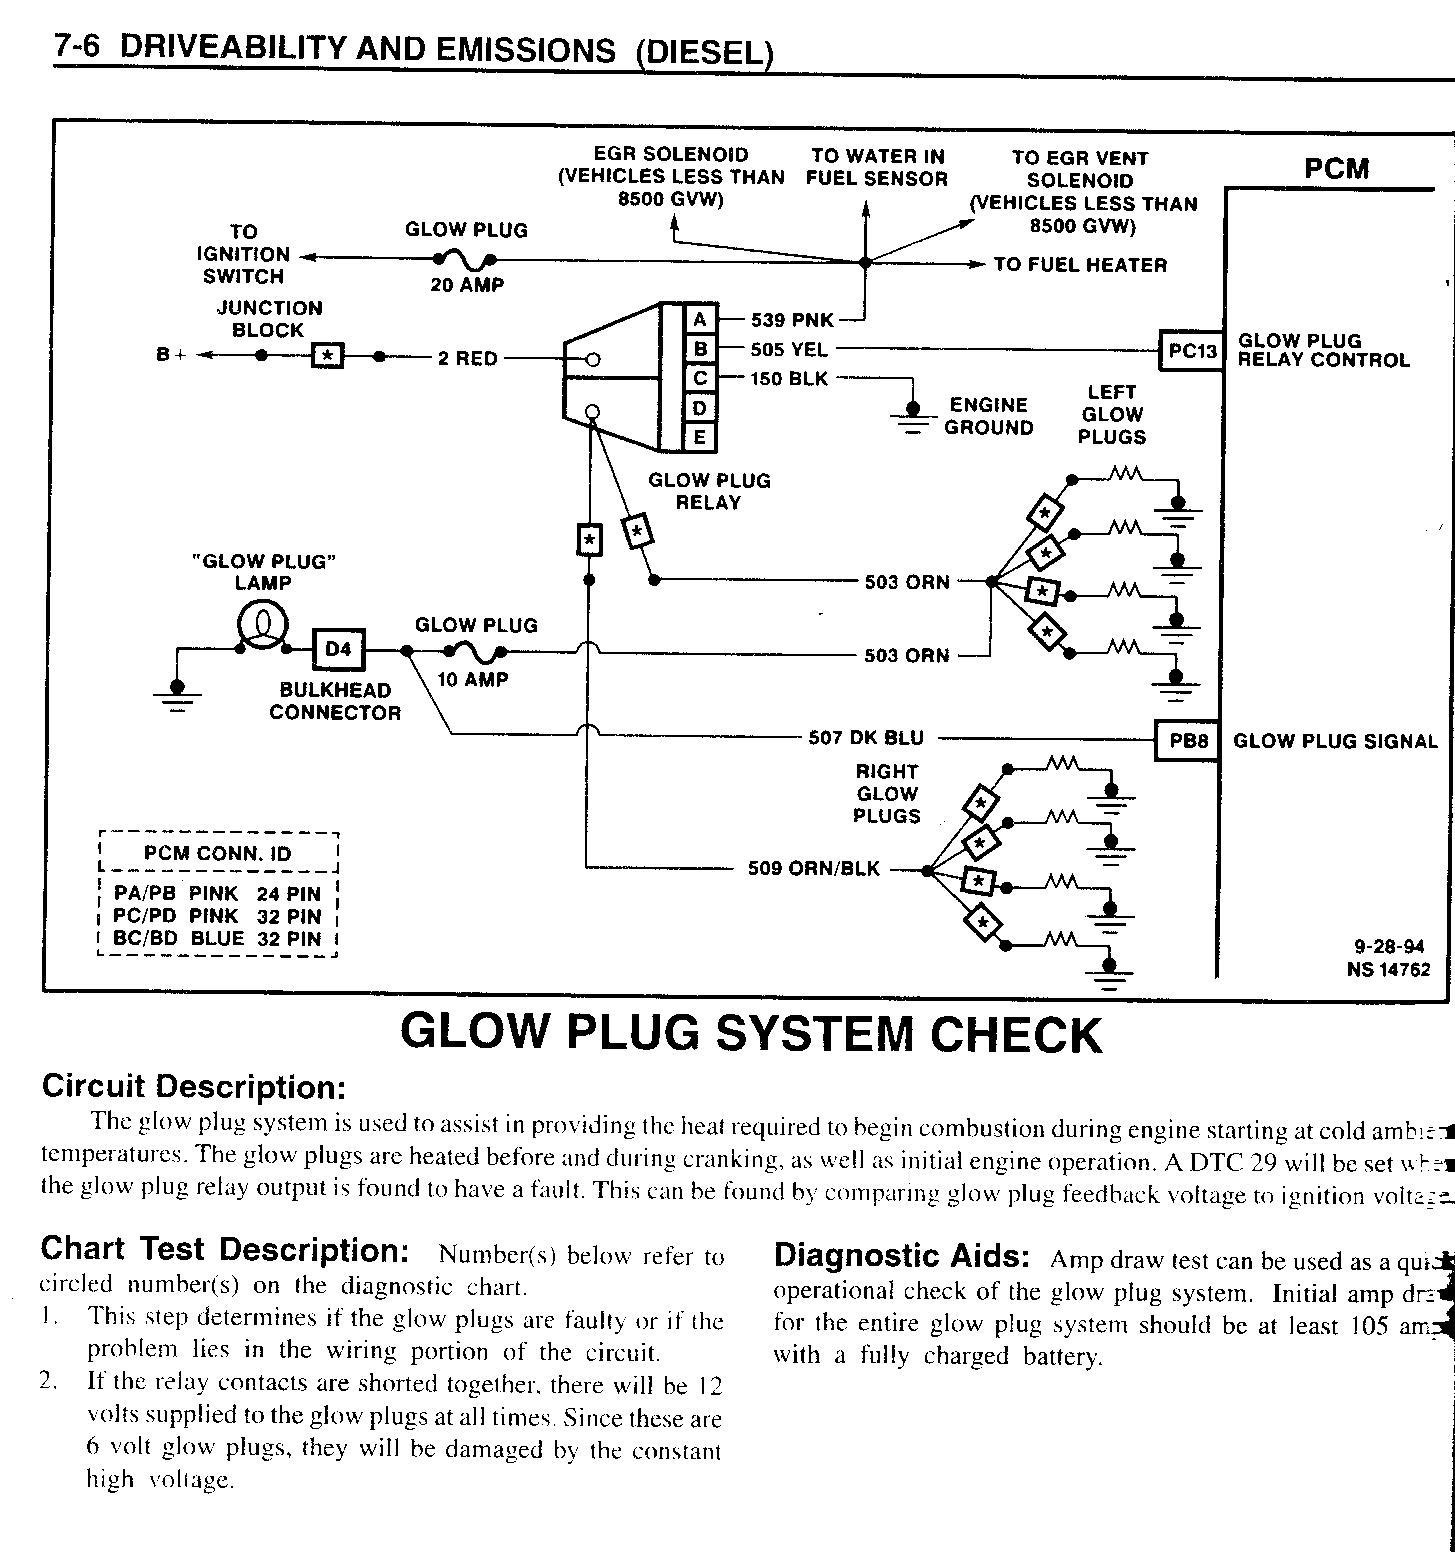 hight resolution of glow plug 6 0 wire harness system wiring diagram blog rh 30 fuerstliche weine de 2017 silverado glow plug controller for a john deere 4100 glow plug